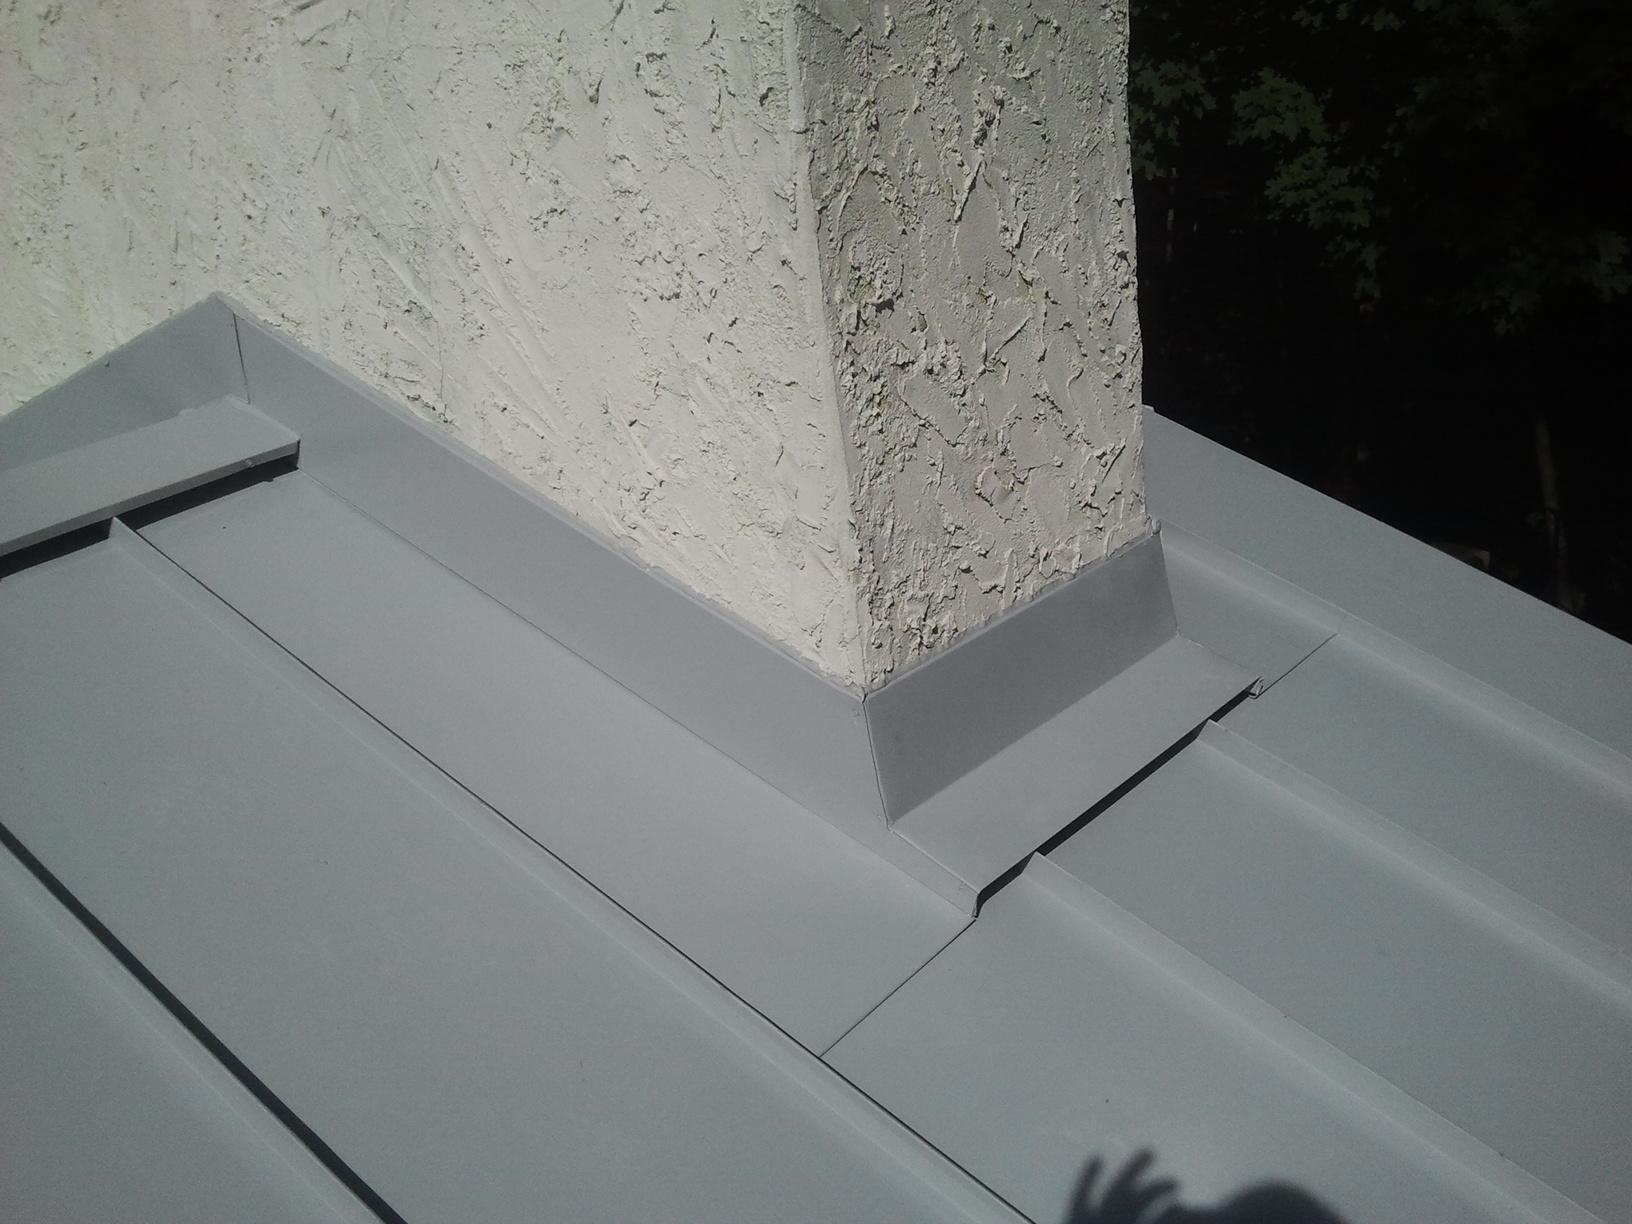 Contemporary Standing Seam Metal Roof Montclair NJ - Chimney Flashing